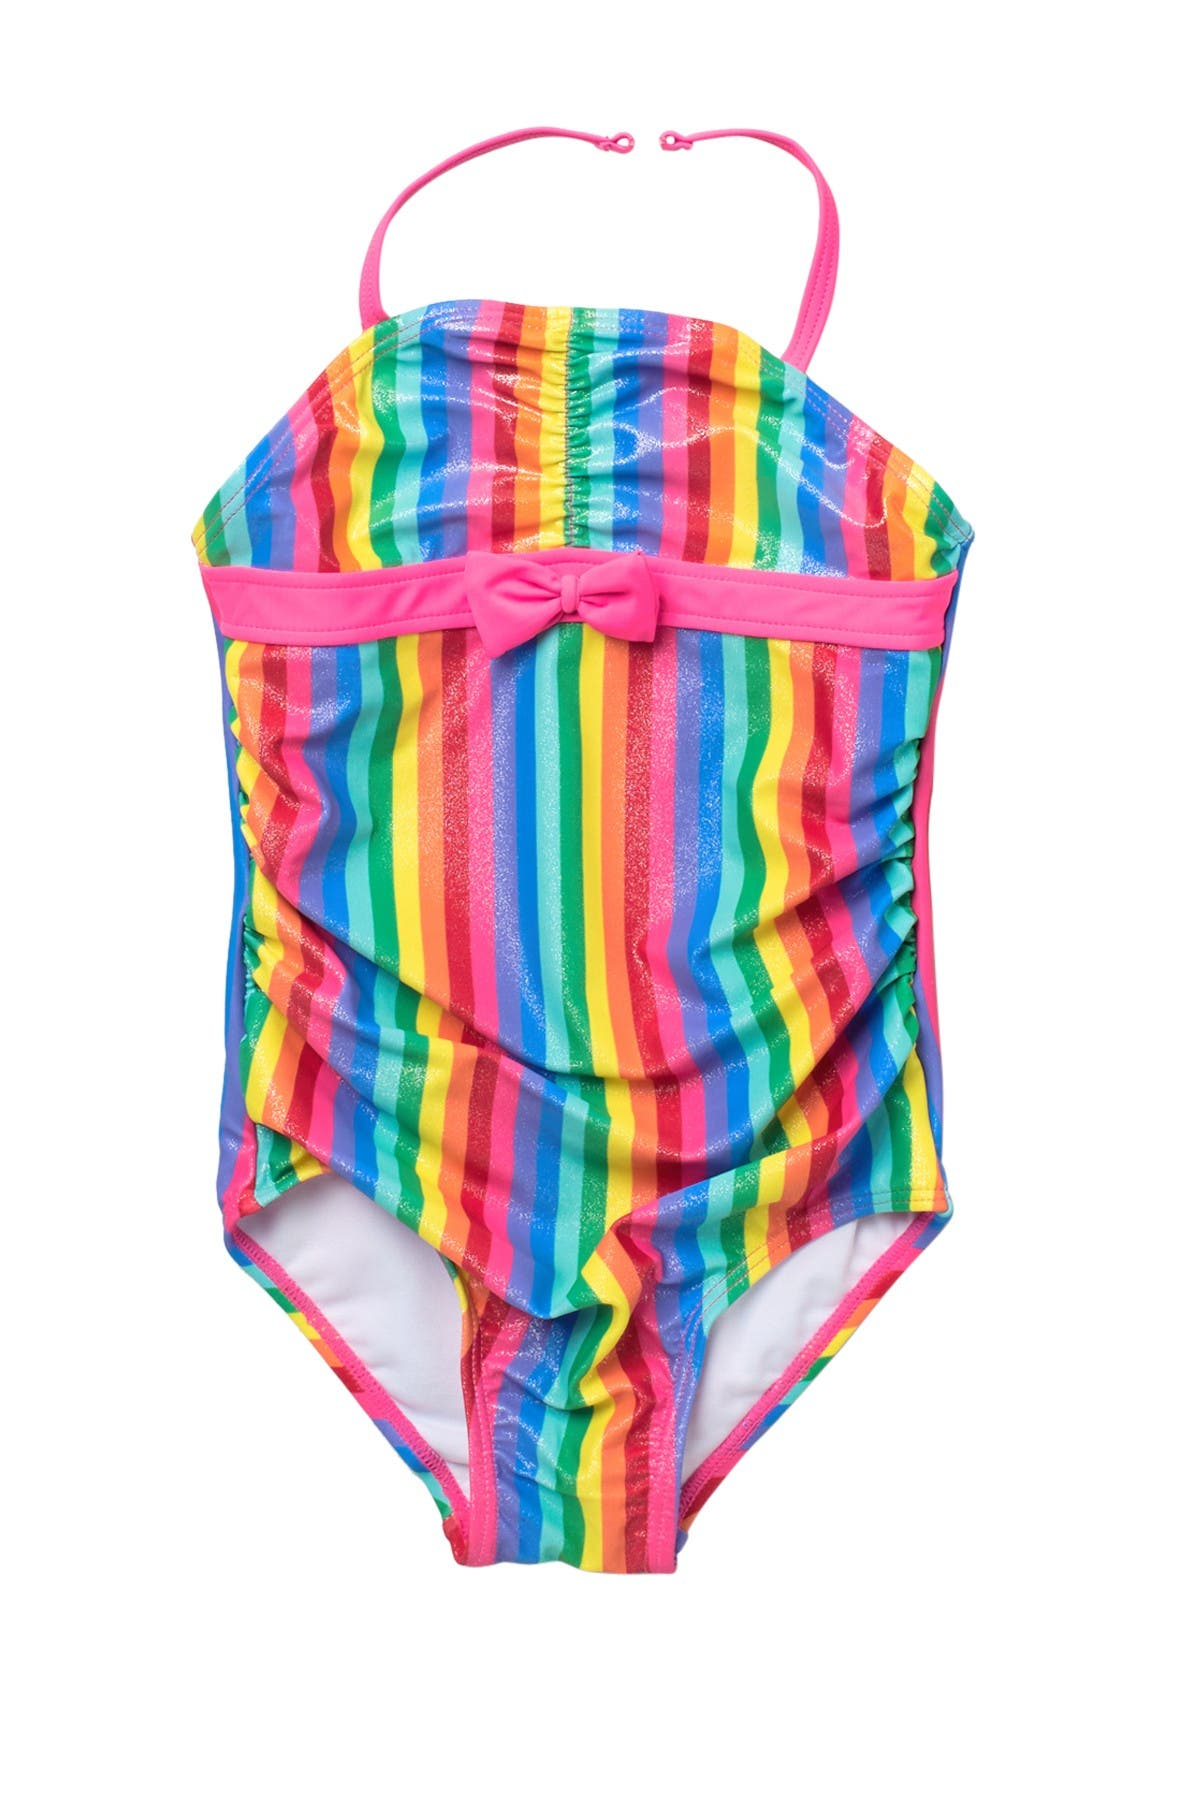 Image of Sol Swim Shimmery Rainbow One-Piece Swimsuit